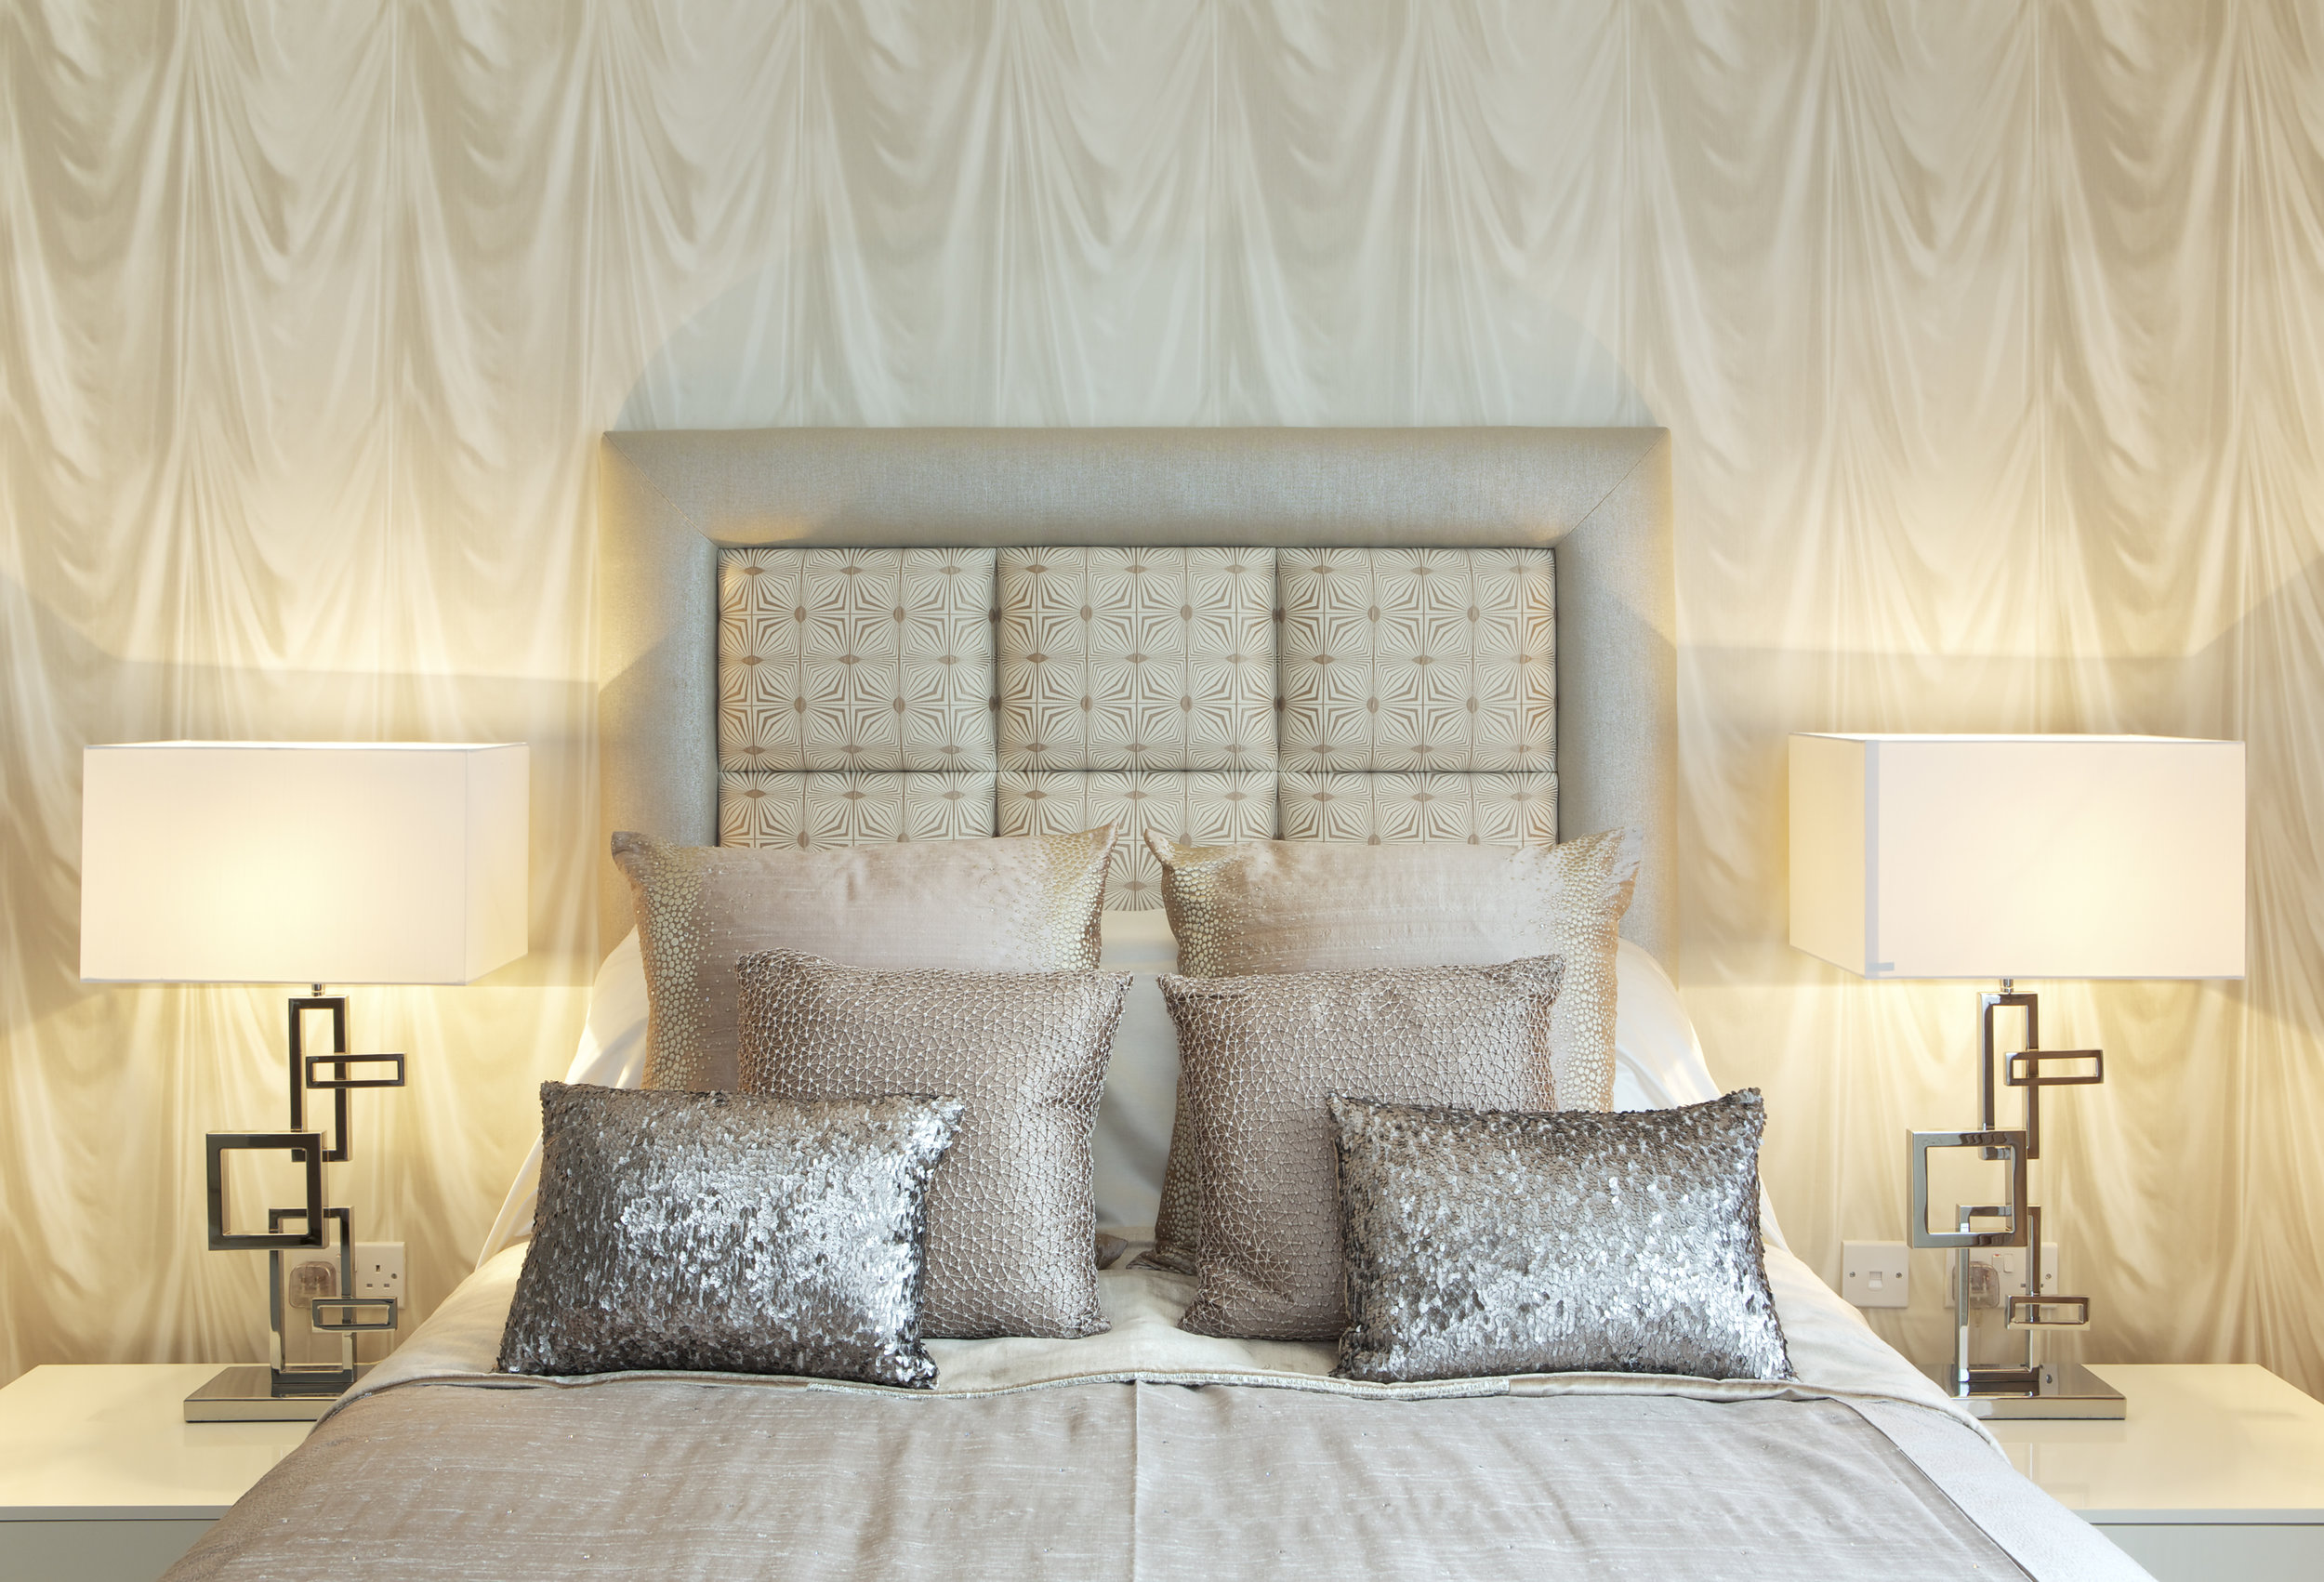 Curtain behind Bed.jpeg